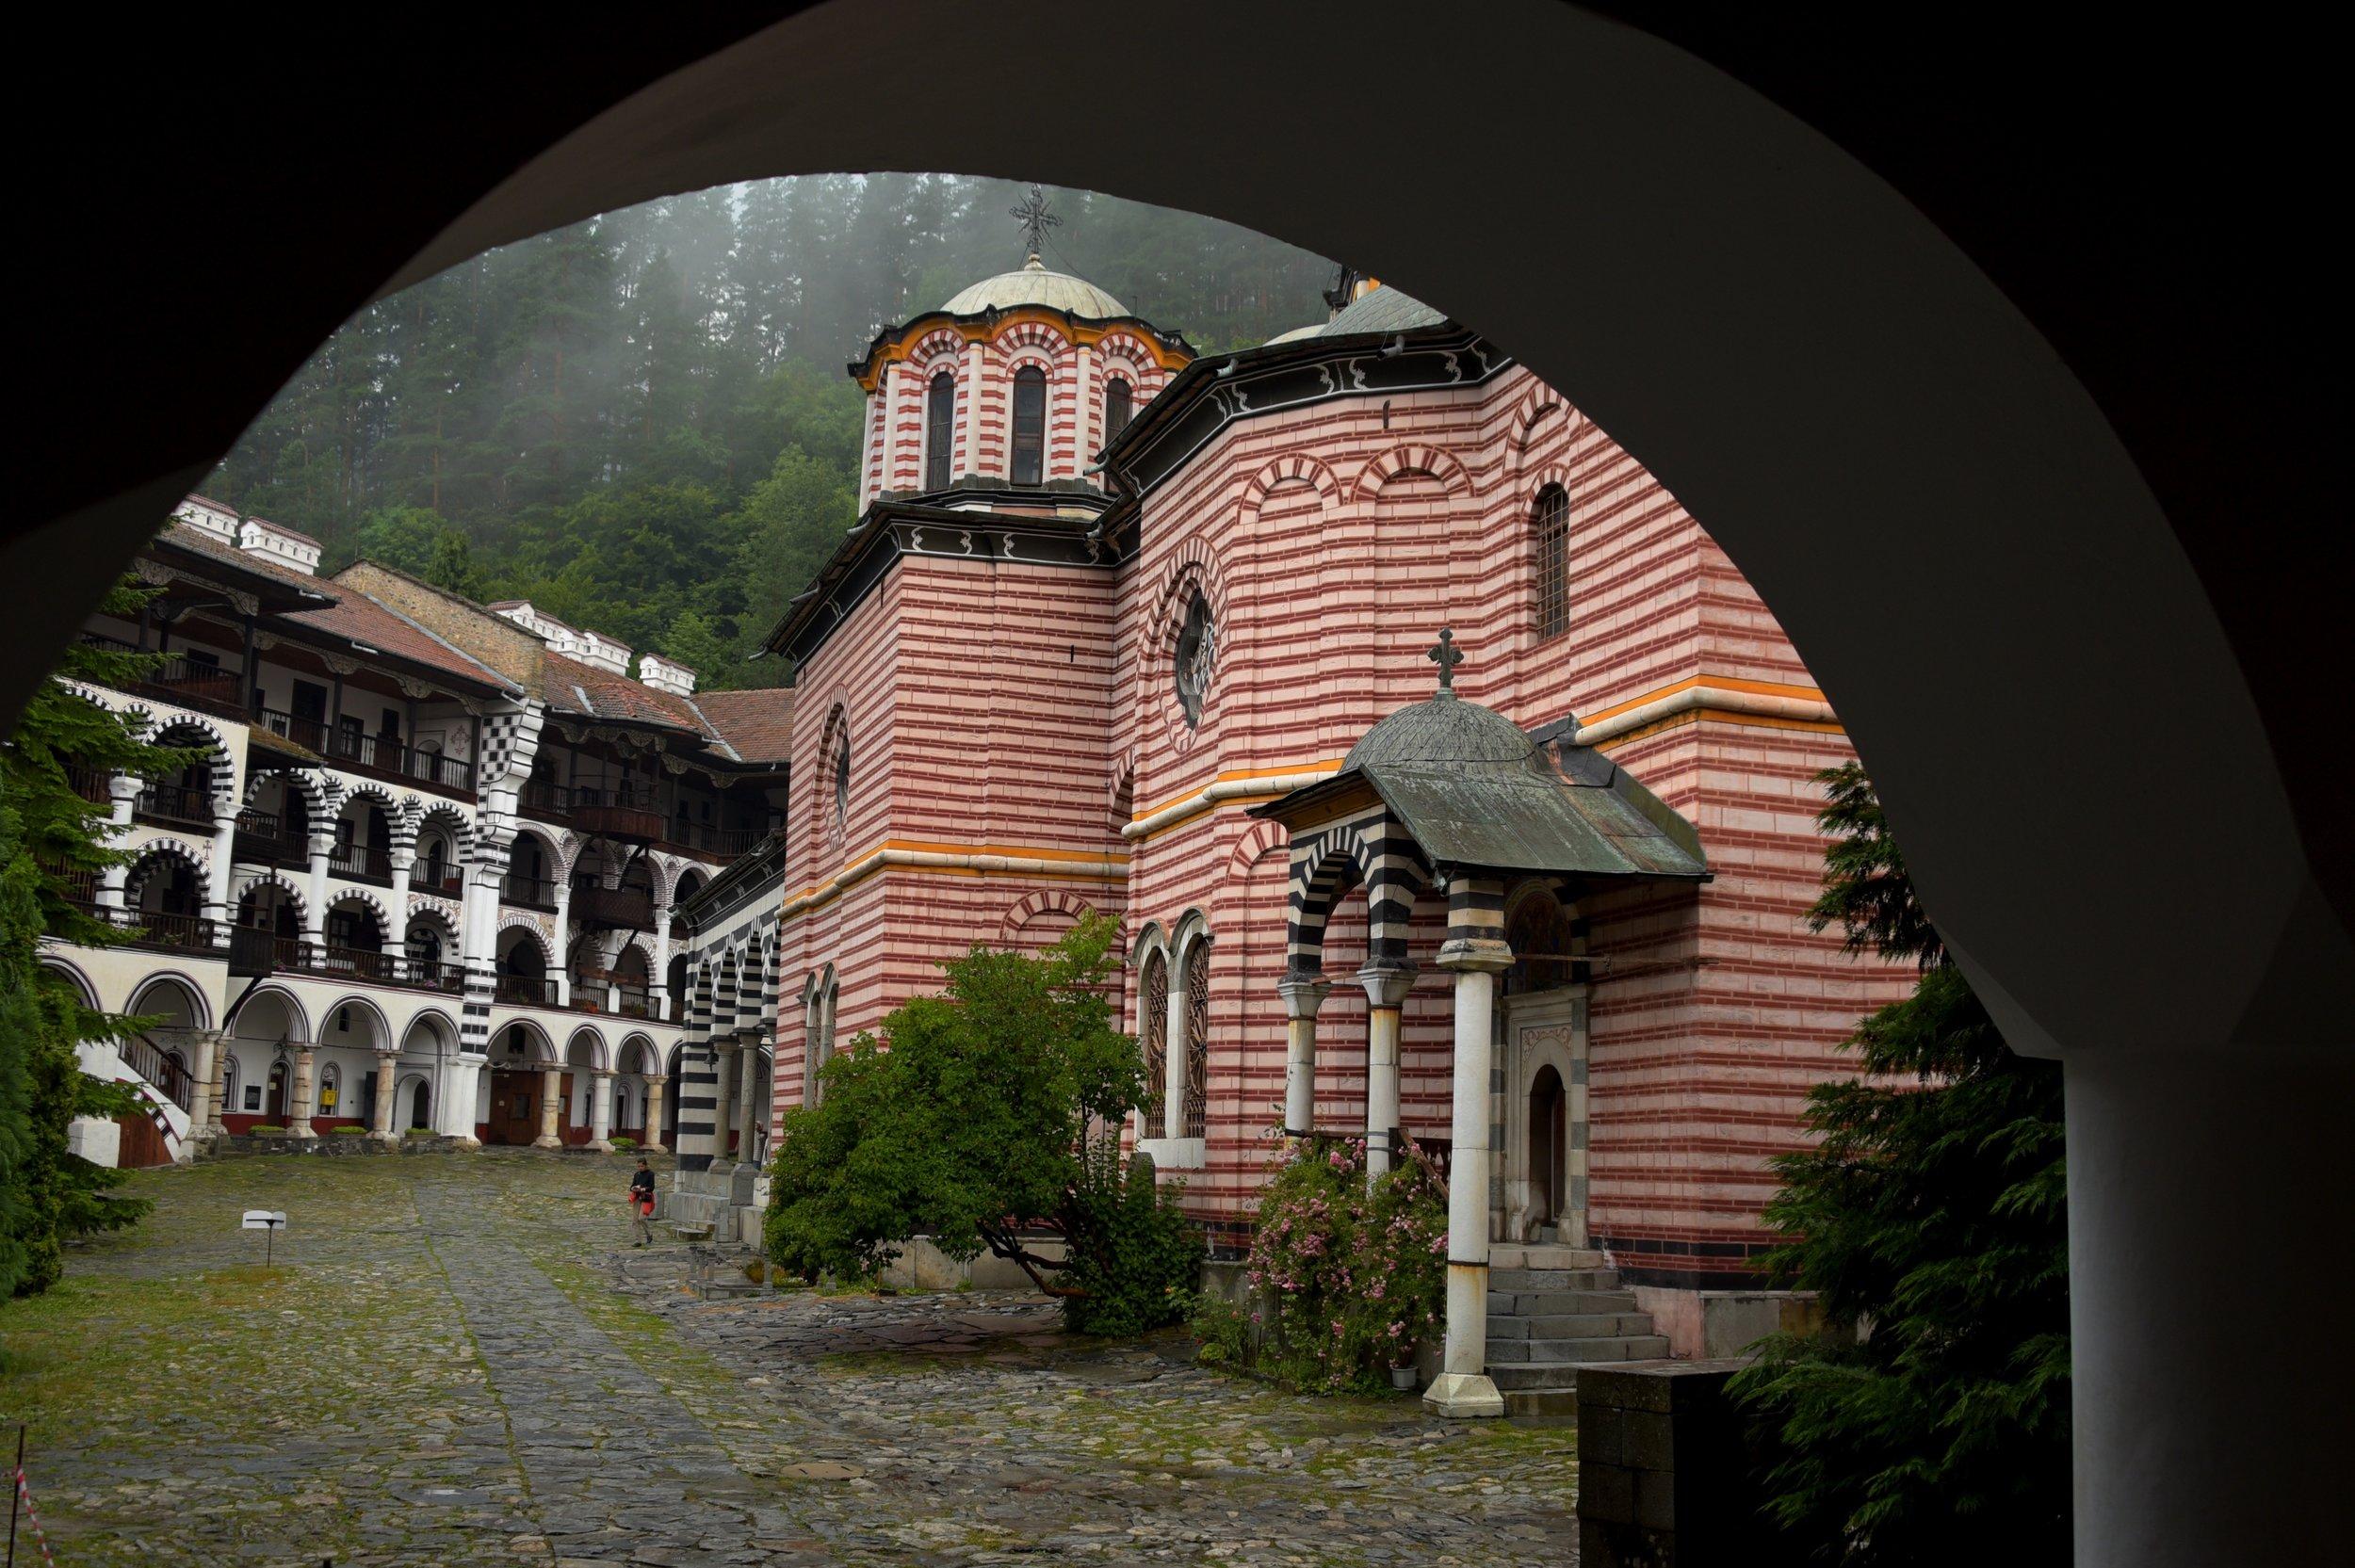 archway-striped-church-black-red-white-cobblestones-rila-monastery-bulgaria-phototours-phil-2016-8840.jpg